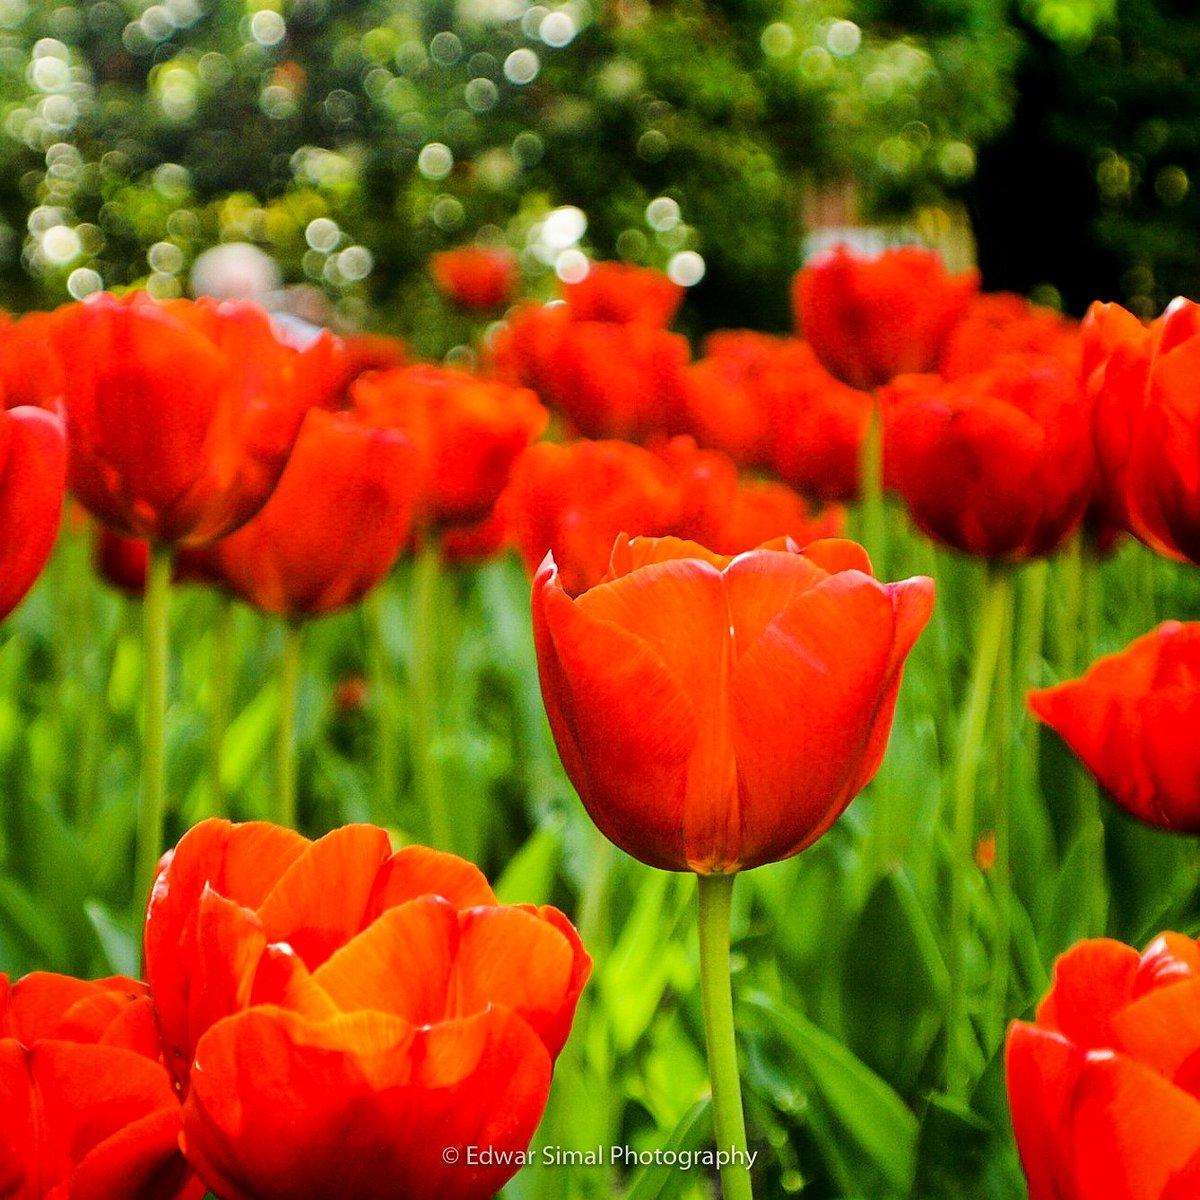 Edwar simal on twitter colors of nature flowers in madrid edwar simal on twitter colors of nature flowers in madrid madrid spain europe flower tulips photooftheday picoftheday photo photography izmirmasajfo